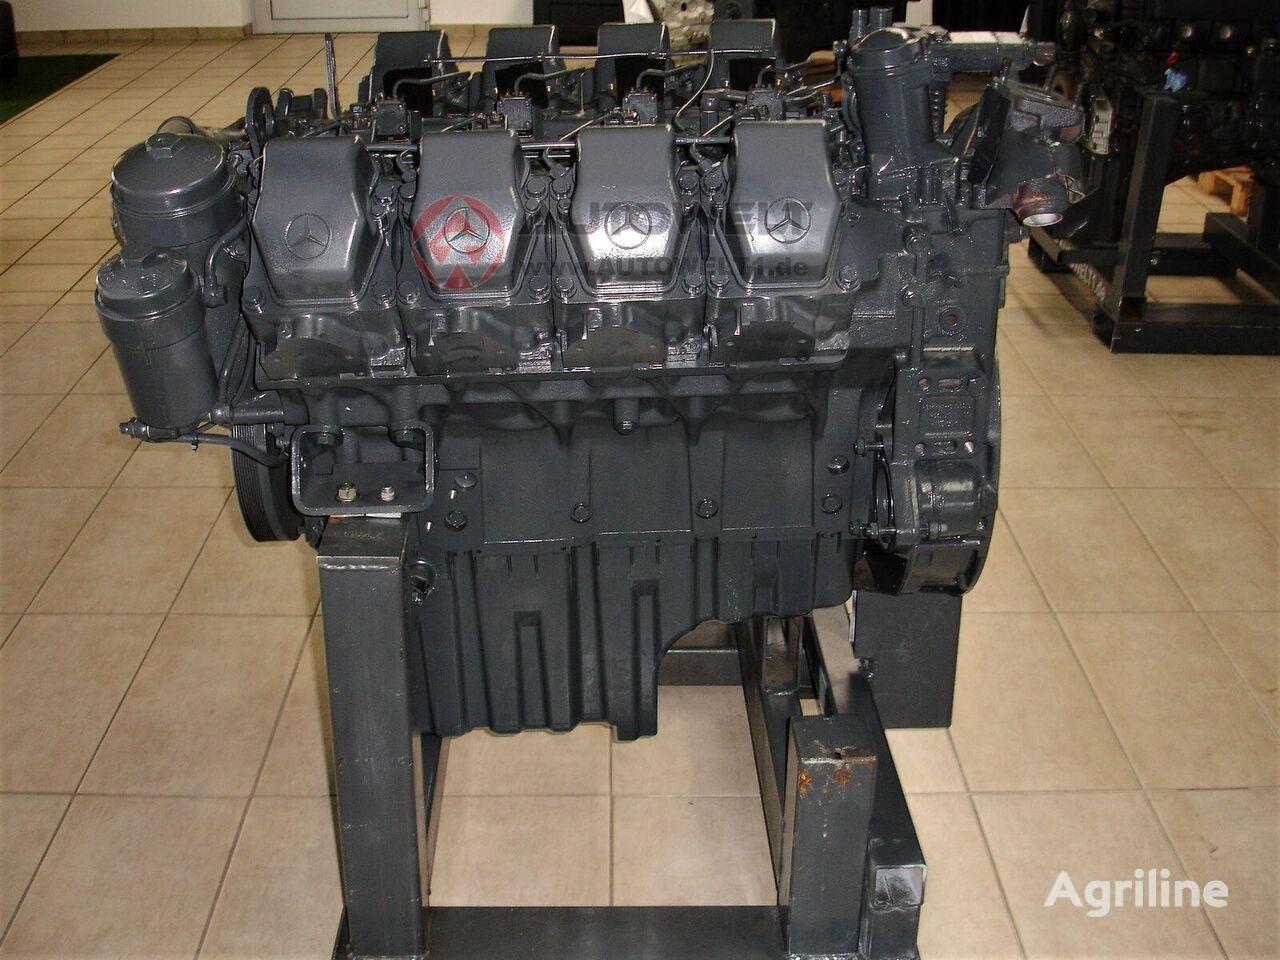 neuer MERCEDES-BENZ OM 502 LA Motor für CLAAS Jaguar Mähdrescher